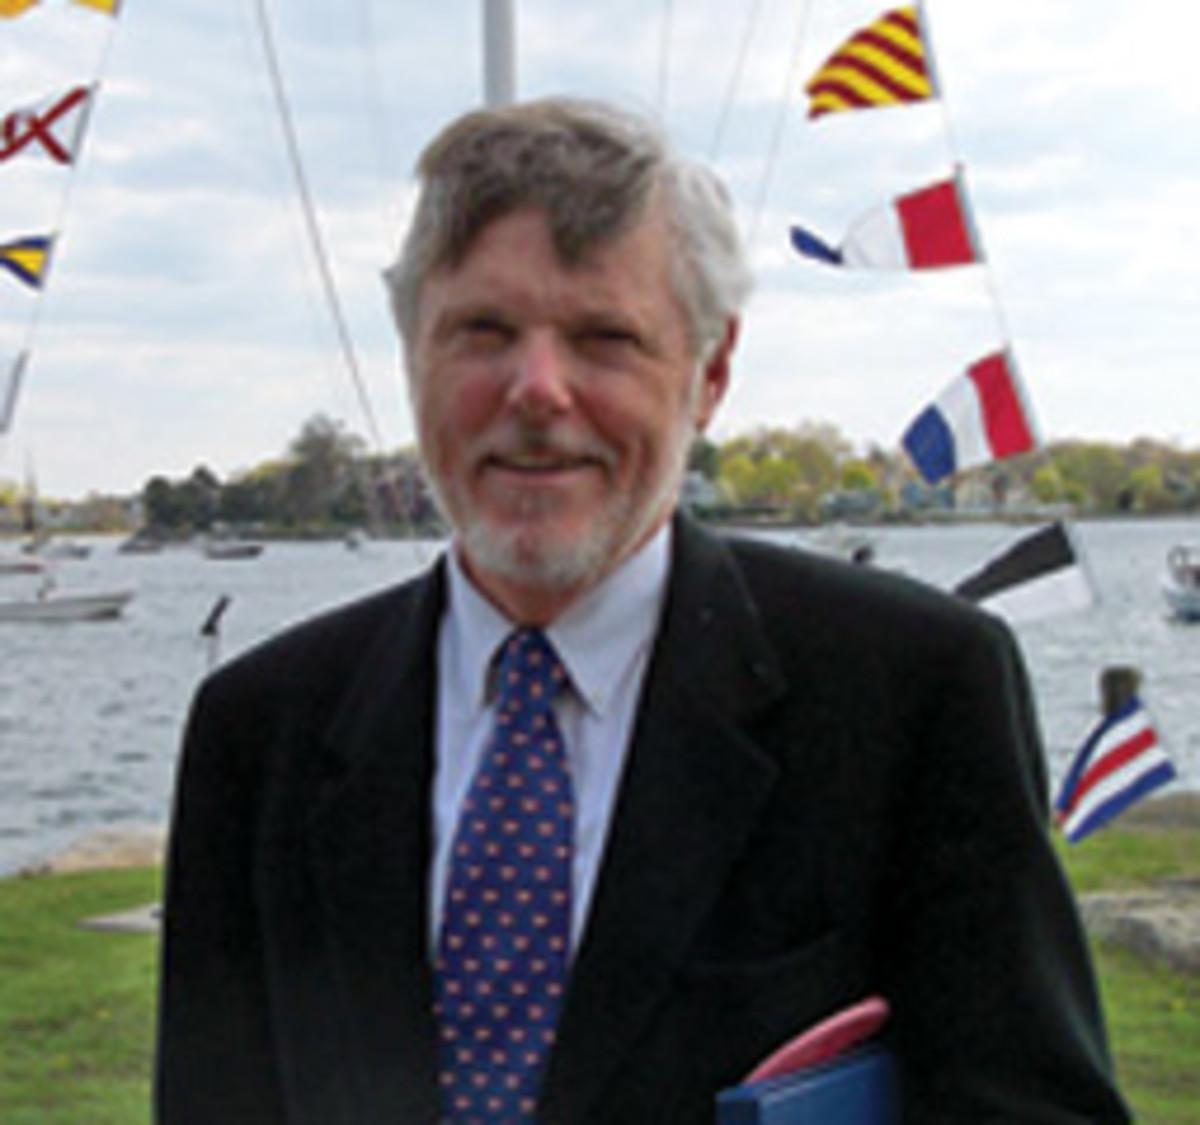 John Love cruises on his Grand Banks, Maramor.